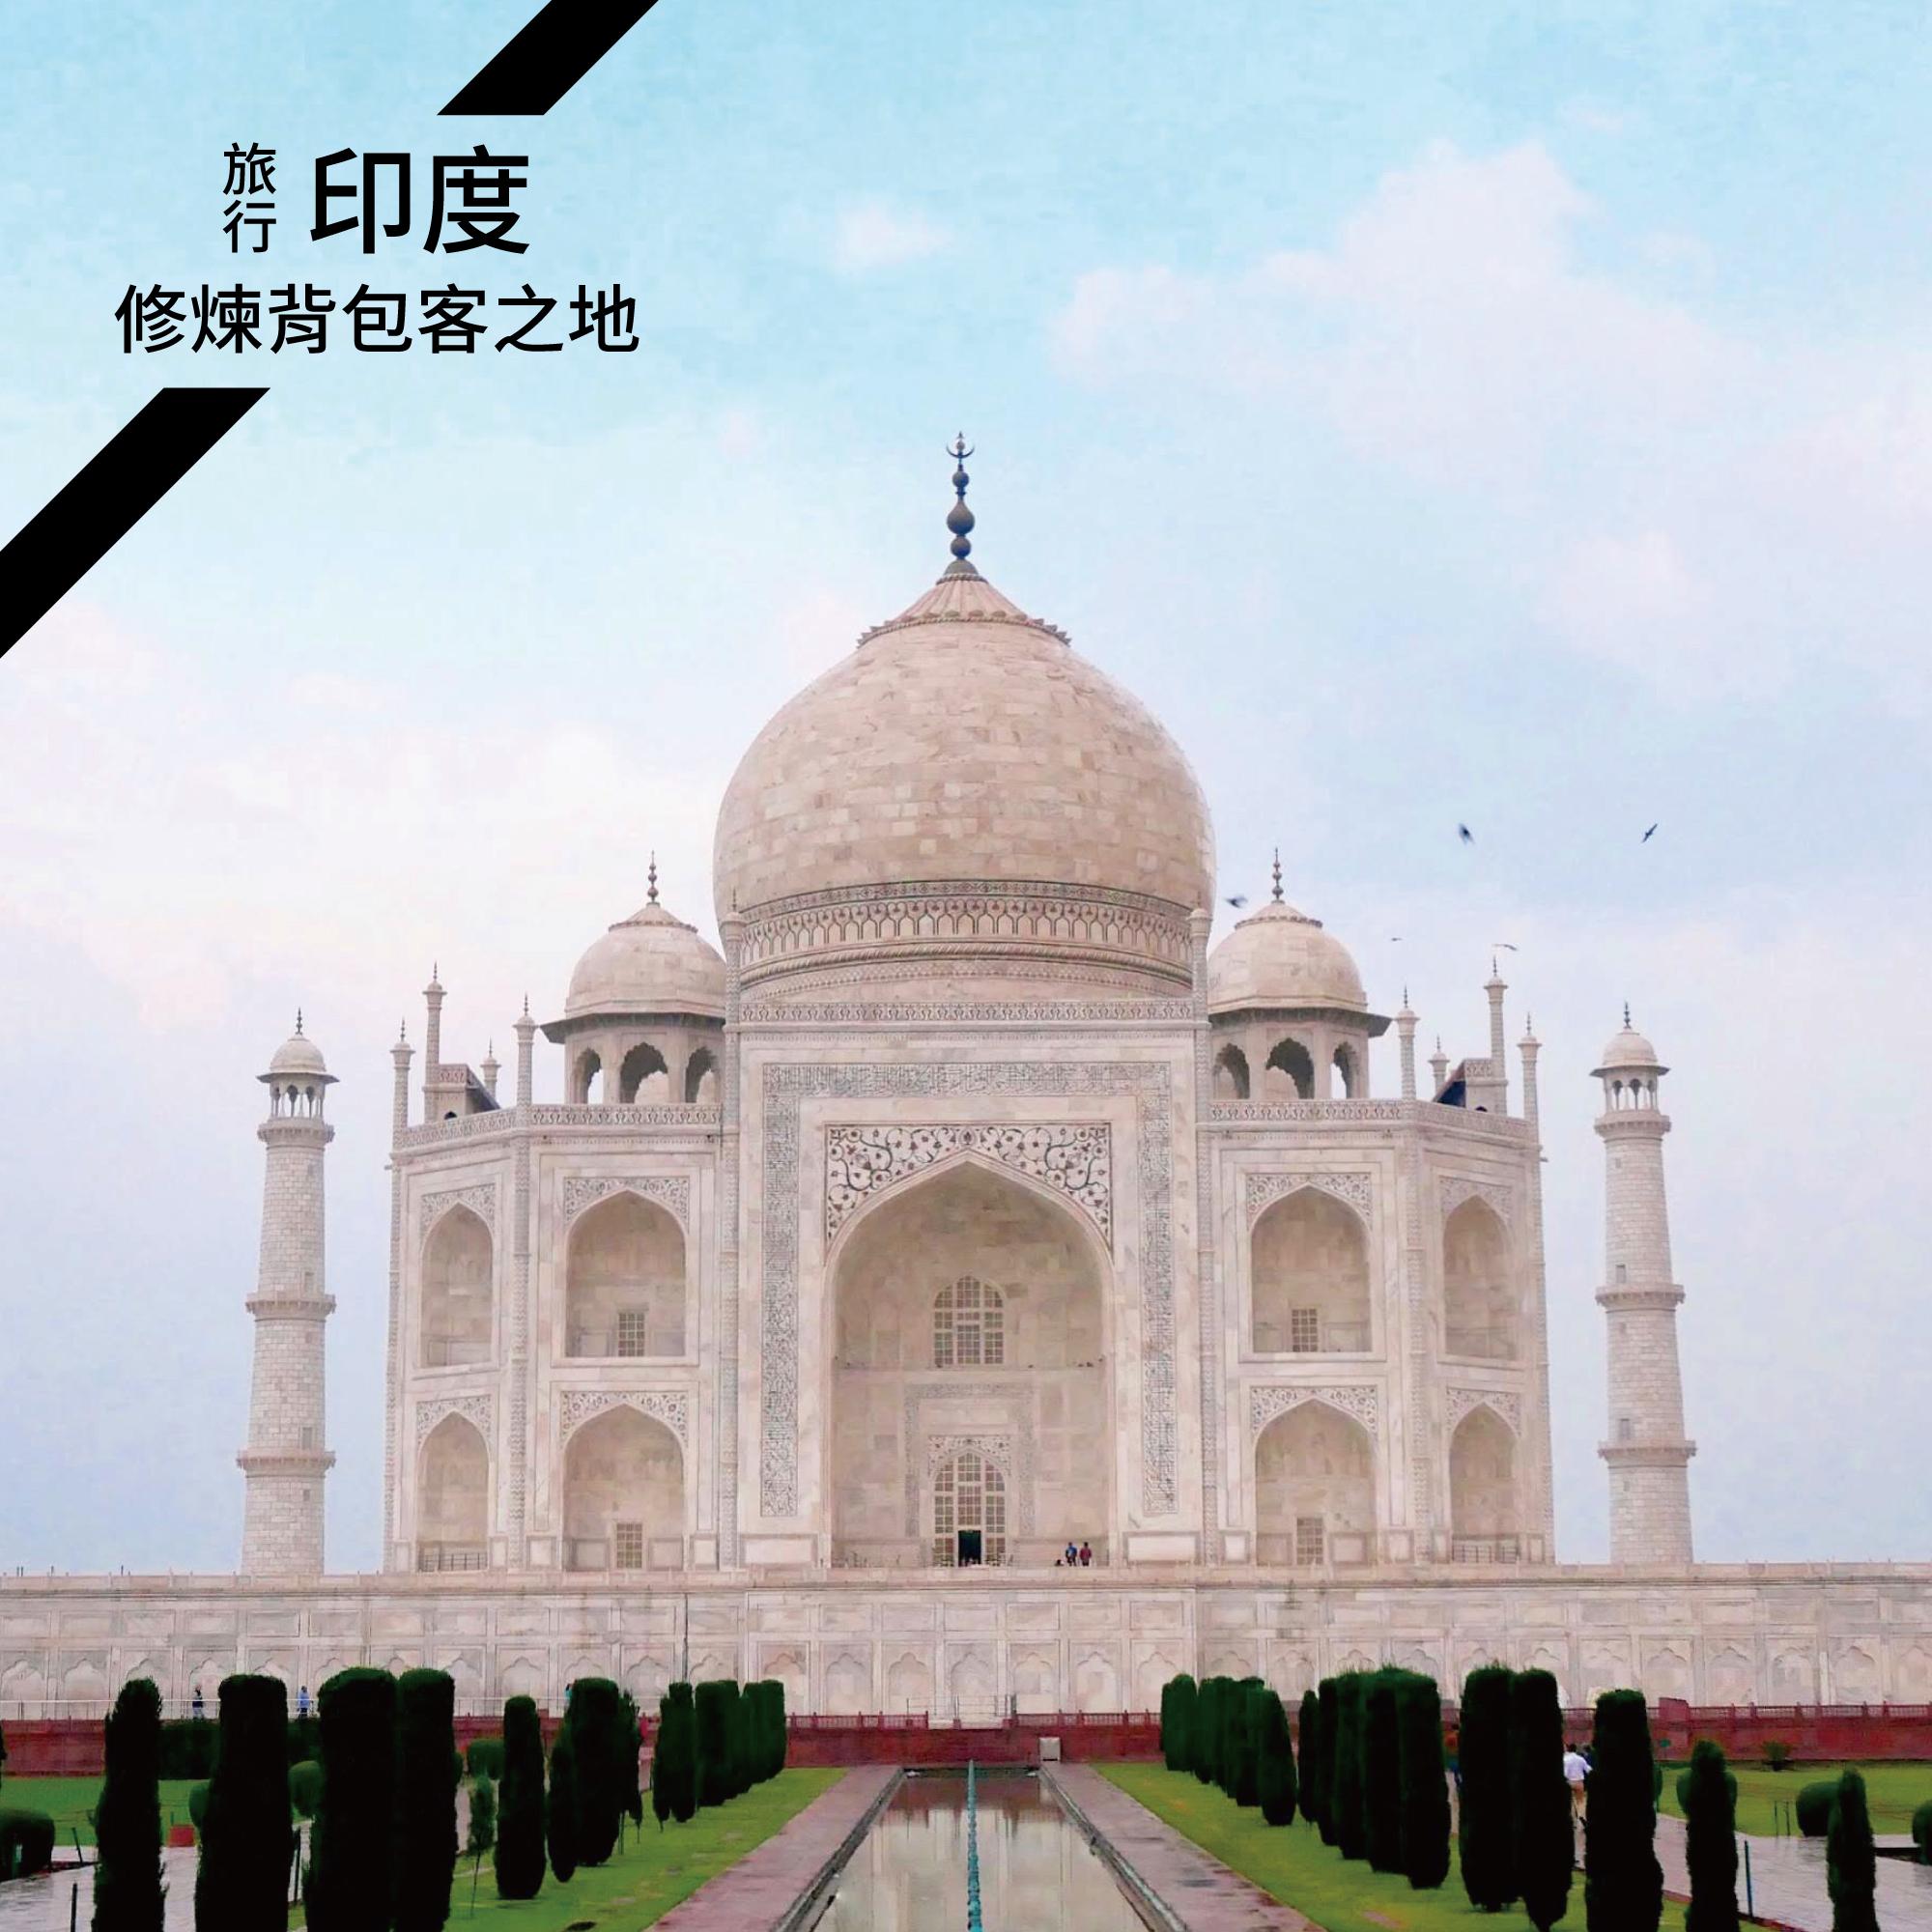 EP76 旅行故事✈人生無限下修的印度┃新德里、齋浦爾、甘地、阿格拉